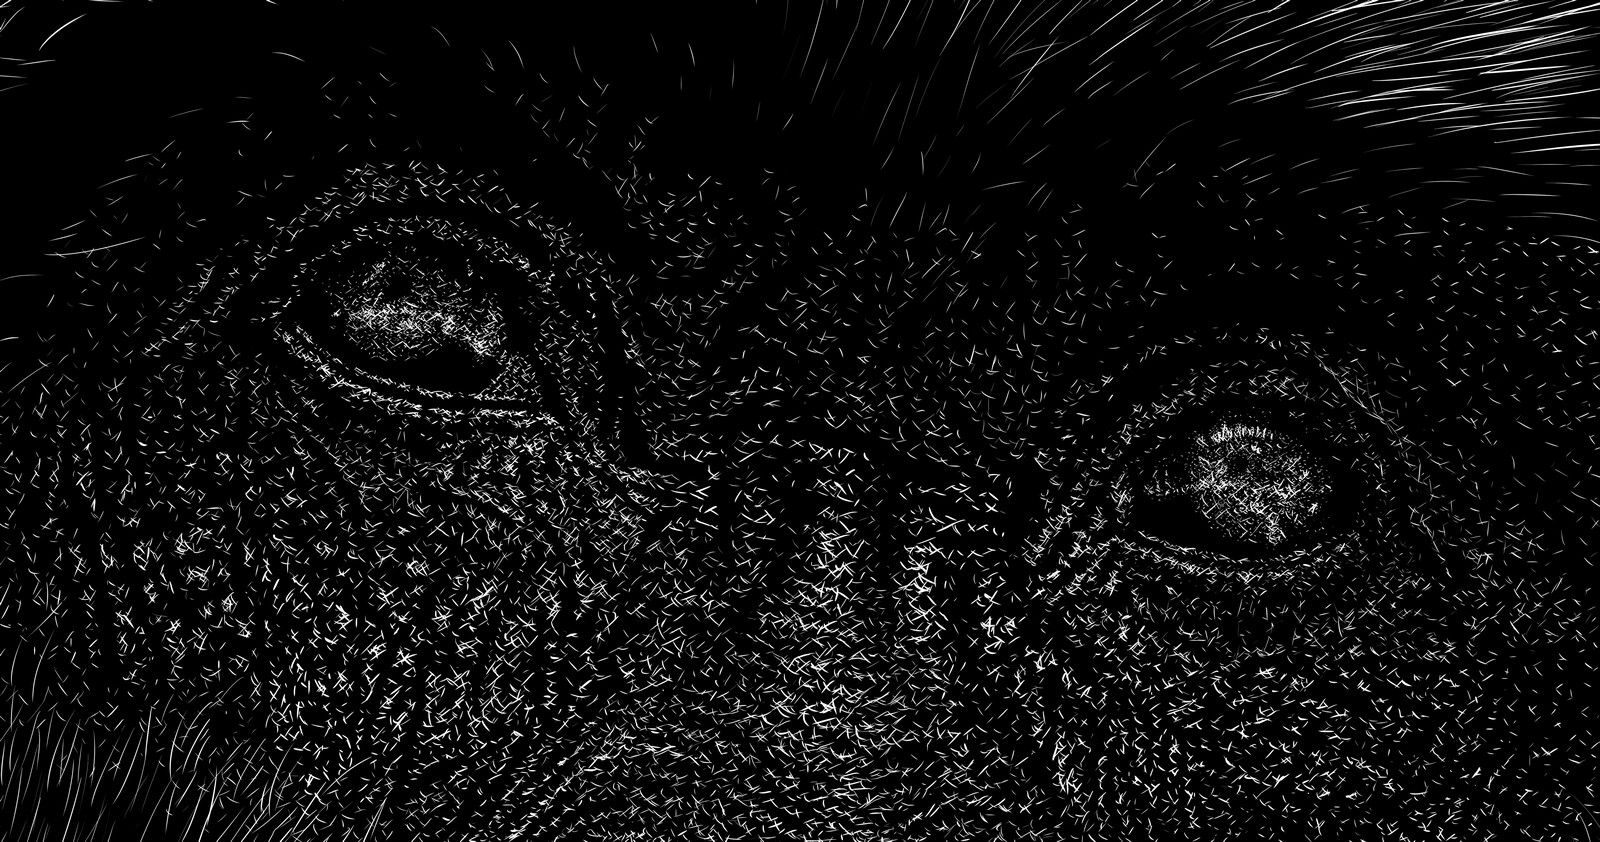 hominoidea, close-up Digital scratchboard, jan. 2019